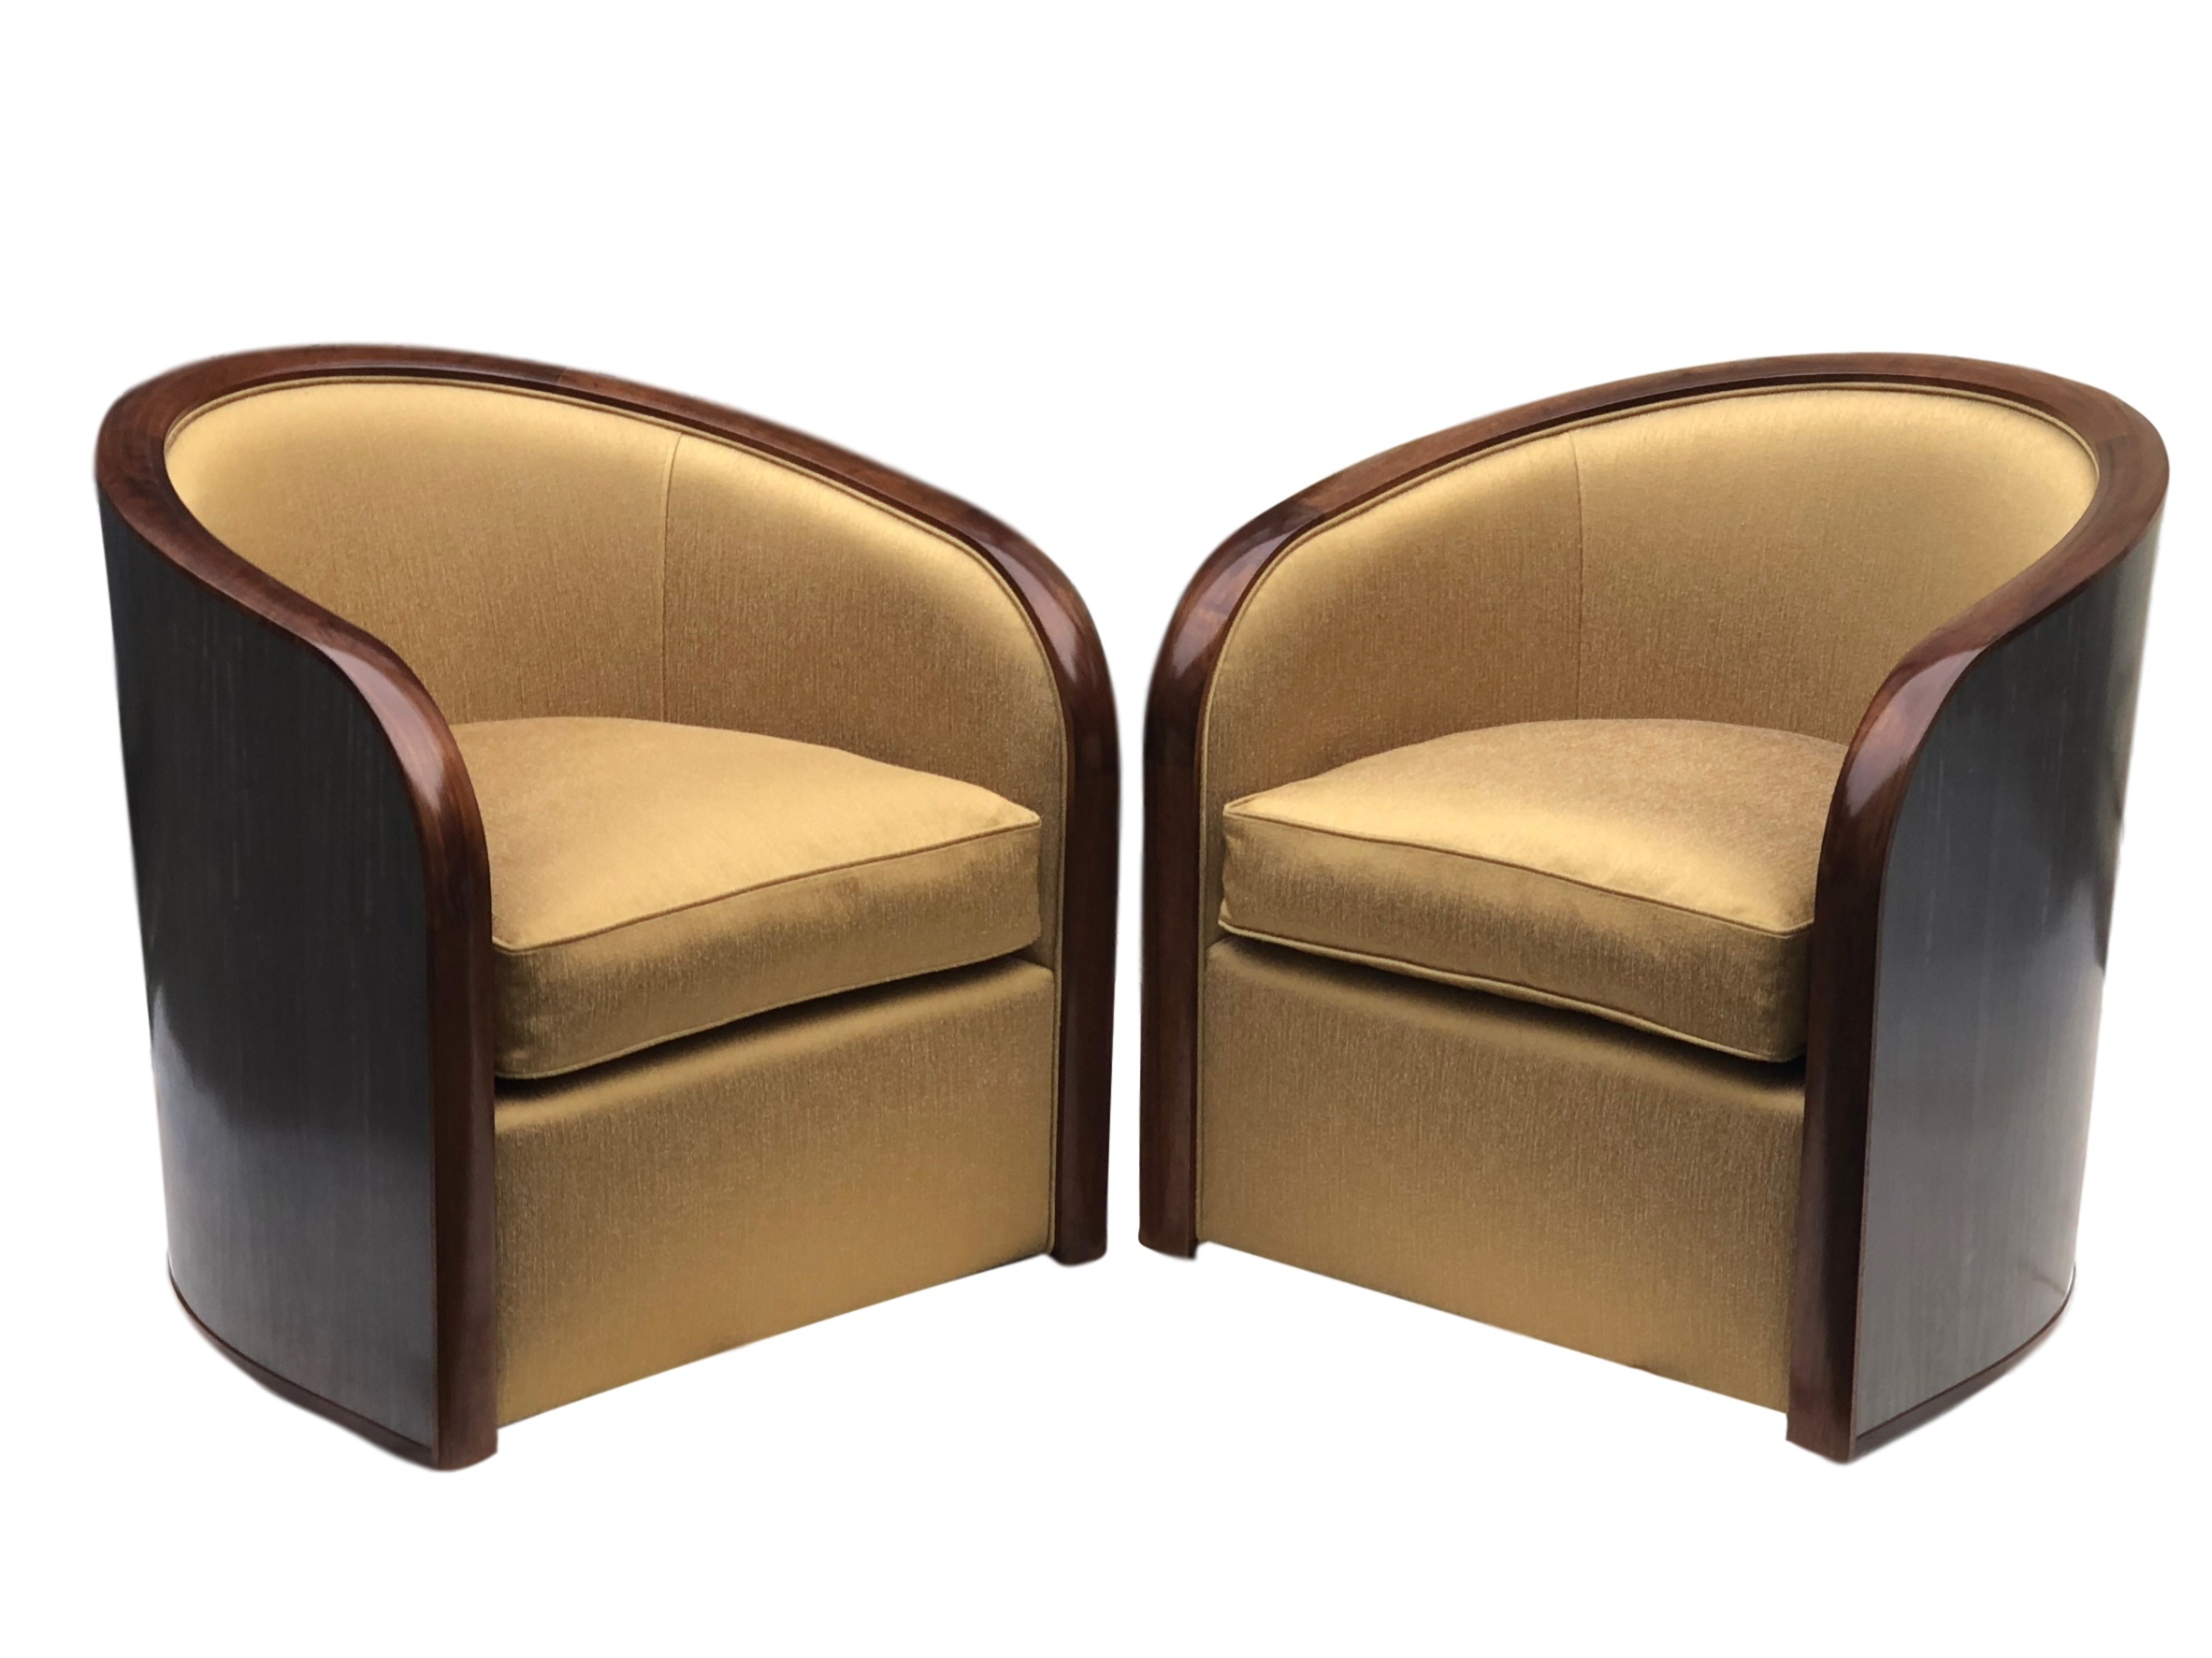 Savoy chairs with showwood backs